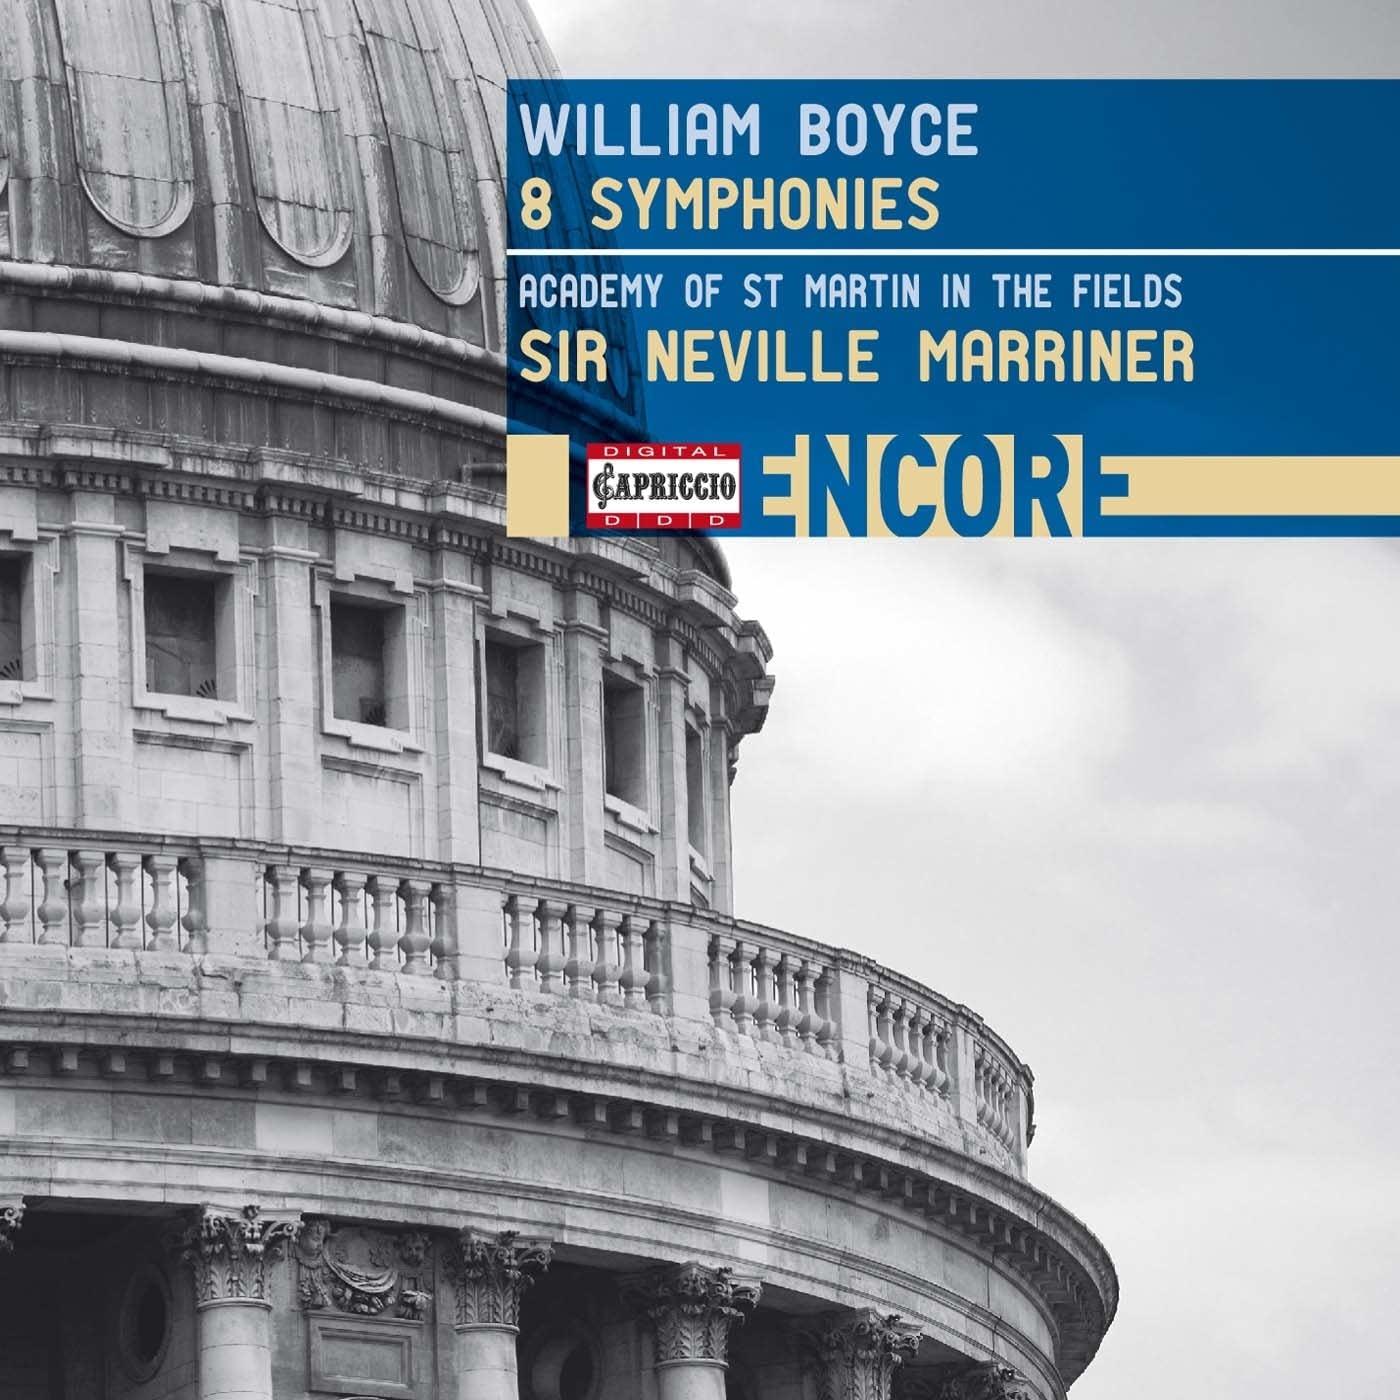 William Boyce - Symphony No. 5